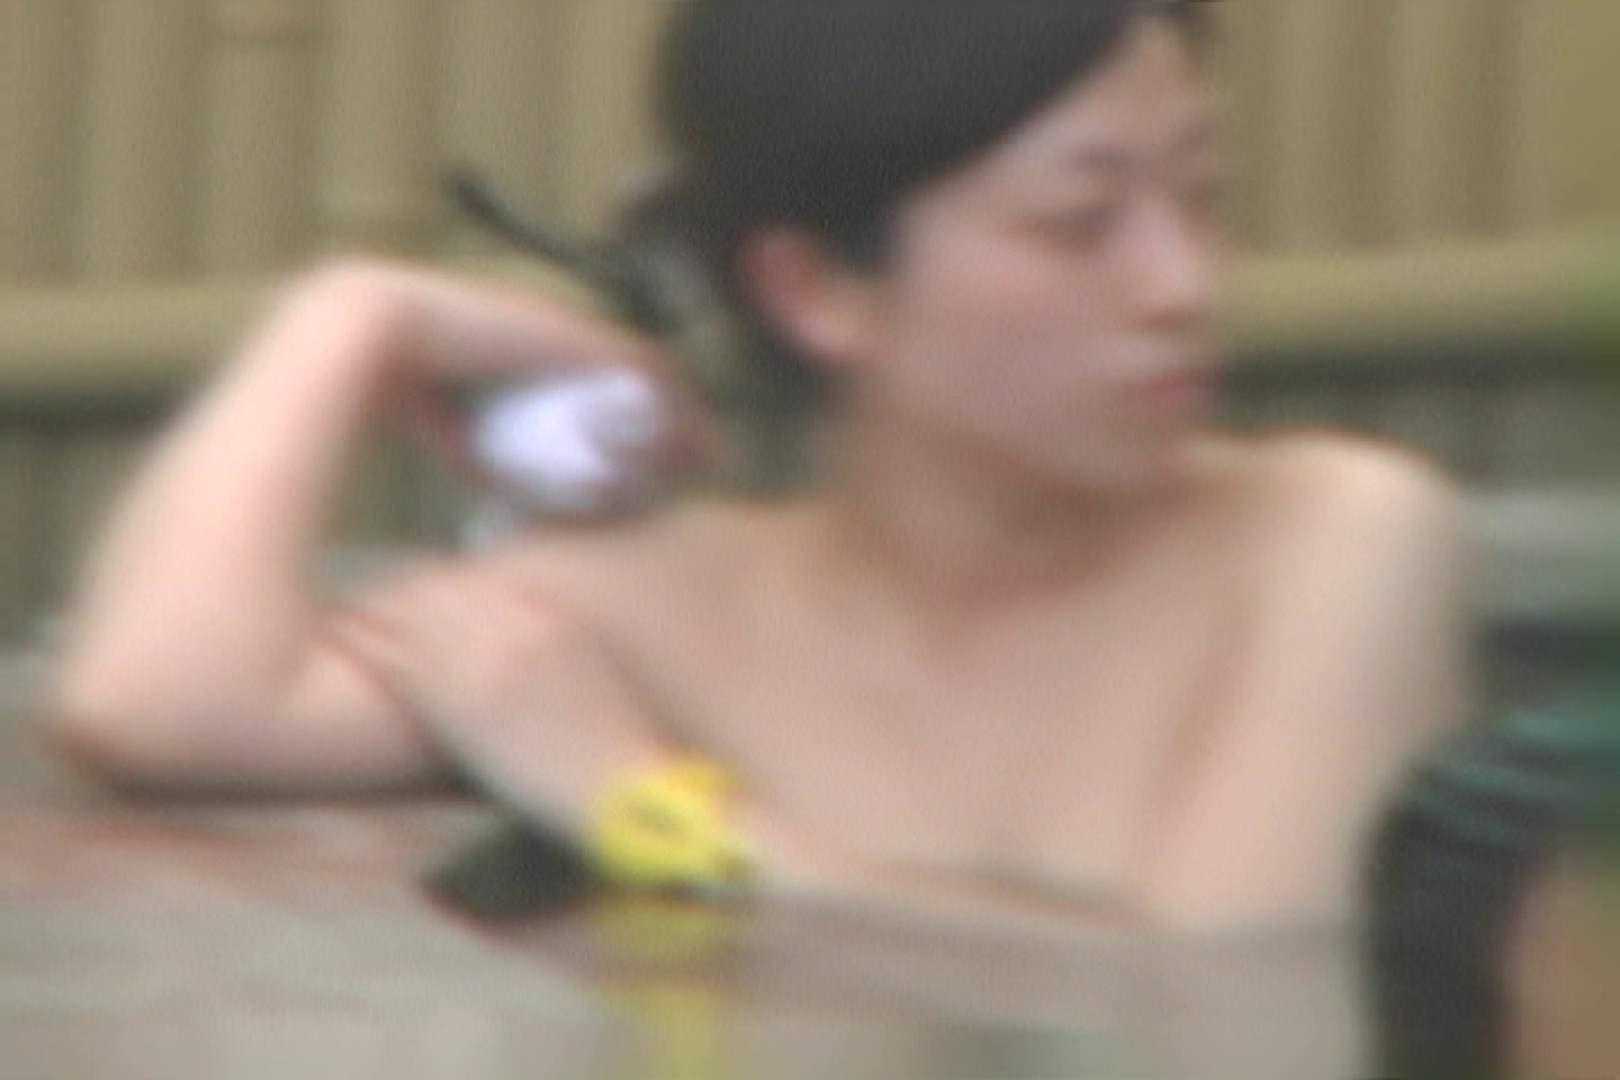 Aquaな露天風呂Vol.562 露天 AV無料動画キャプチャ 109画像 23